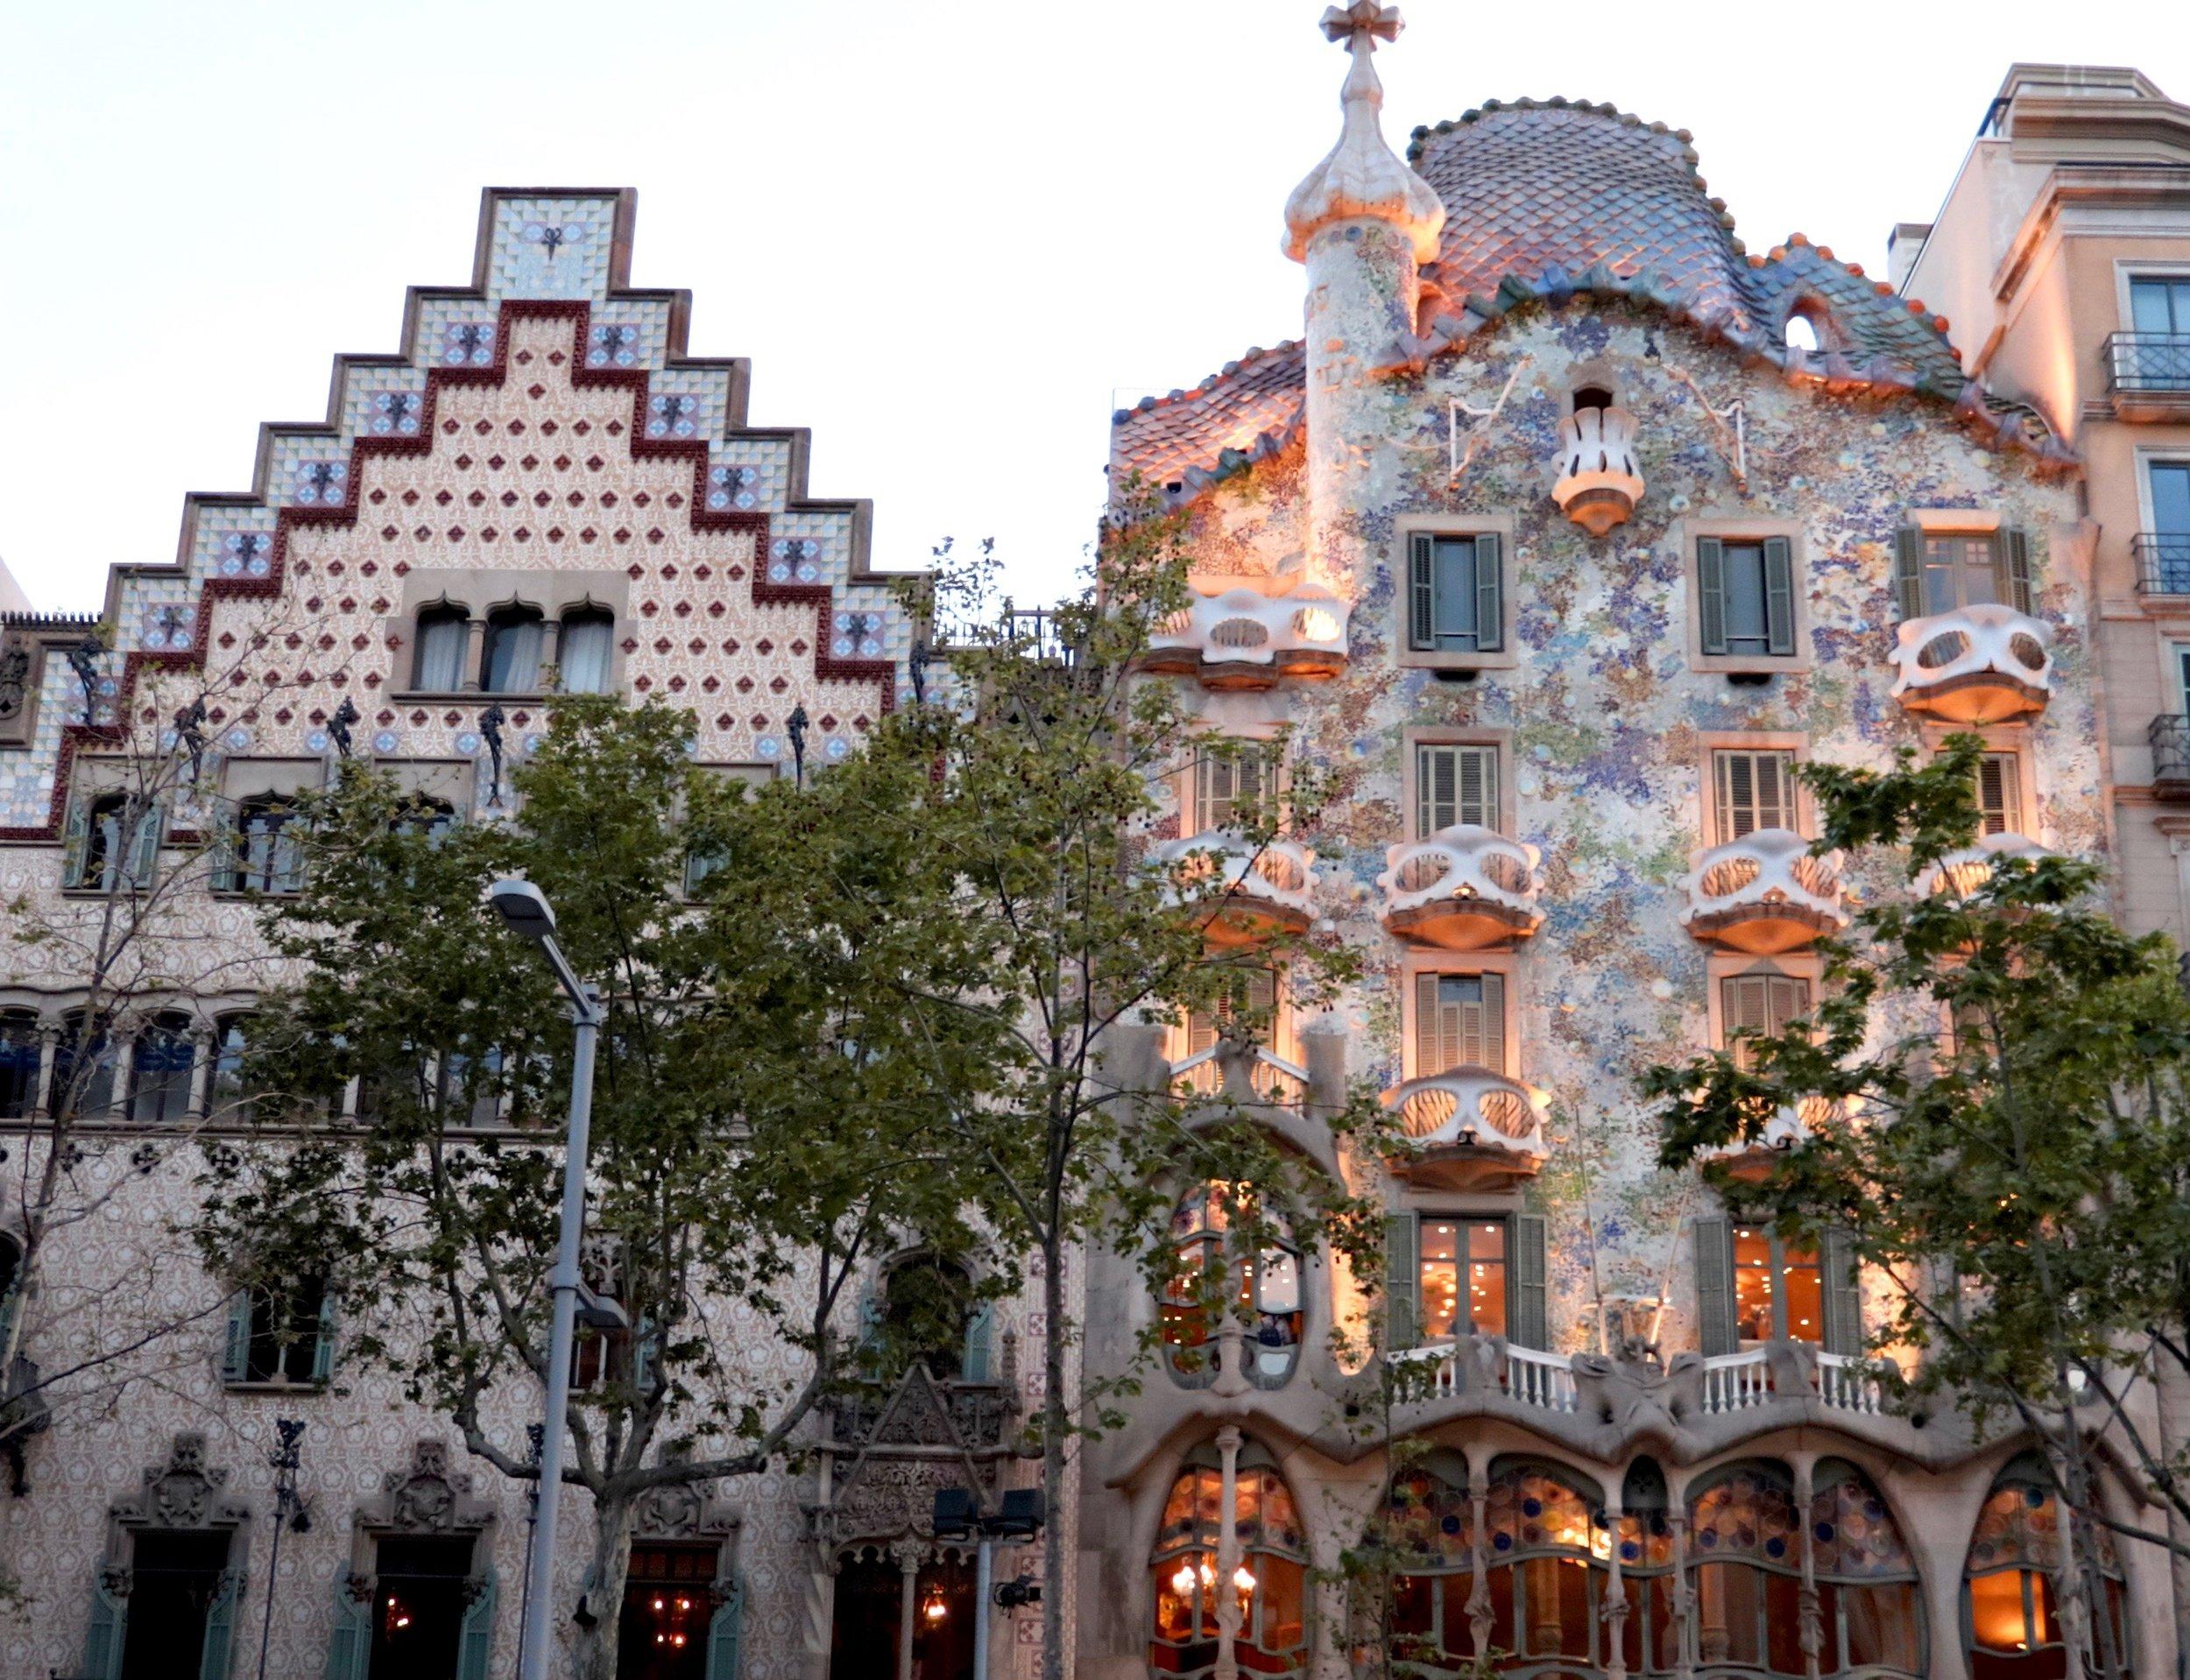 Casa Batllo, by Gaudi. Barcelona.